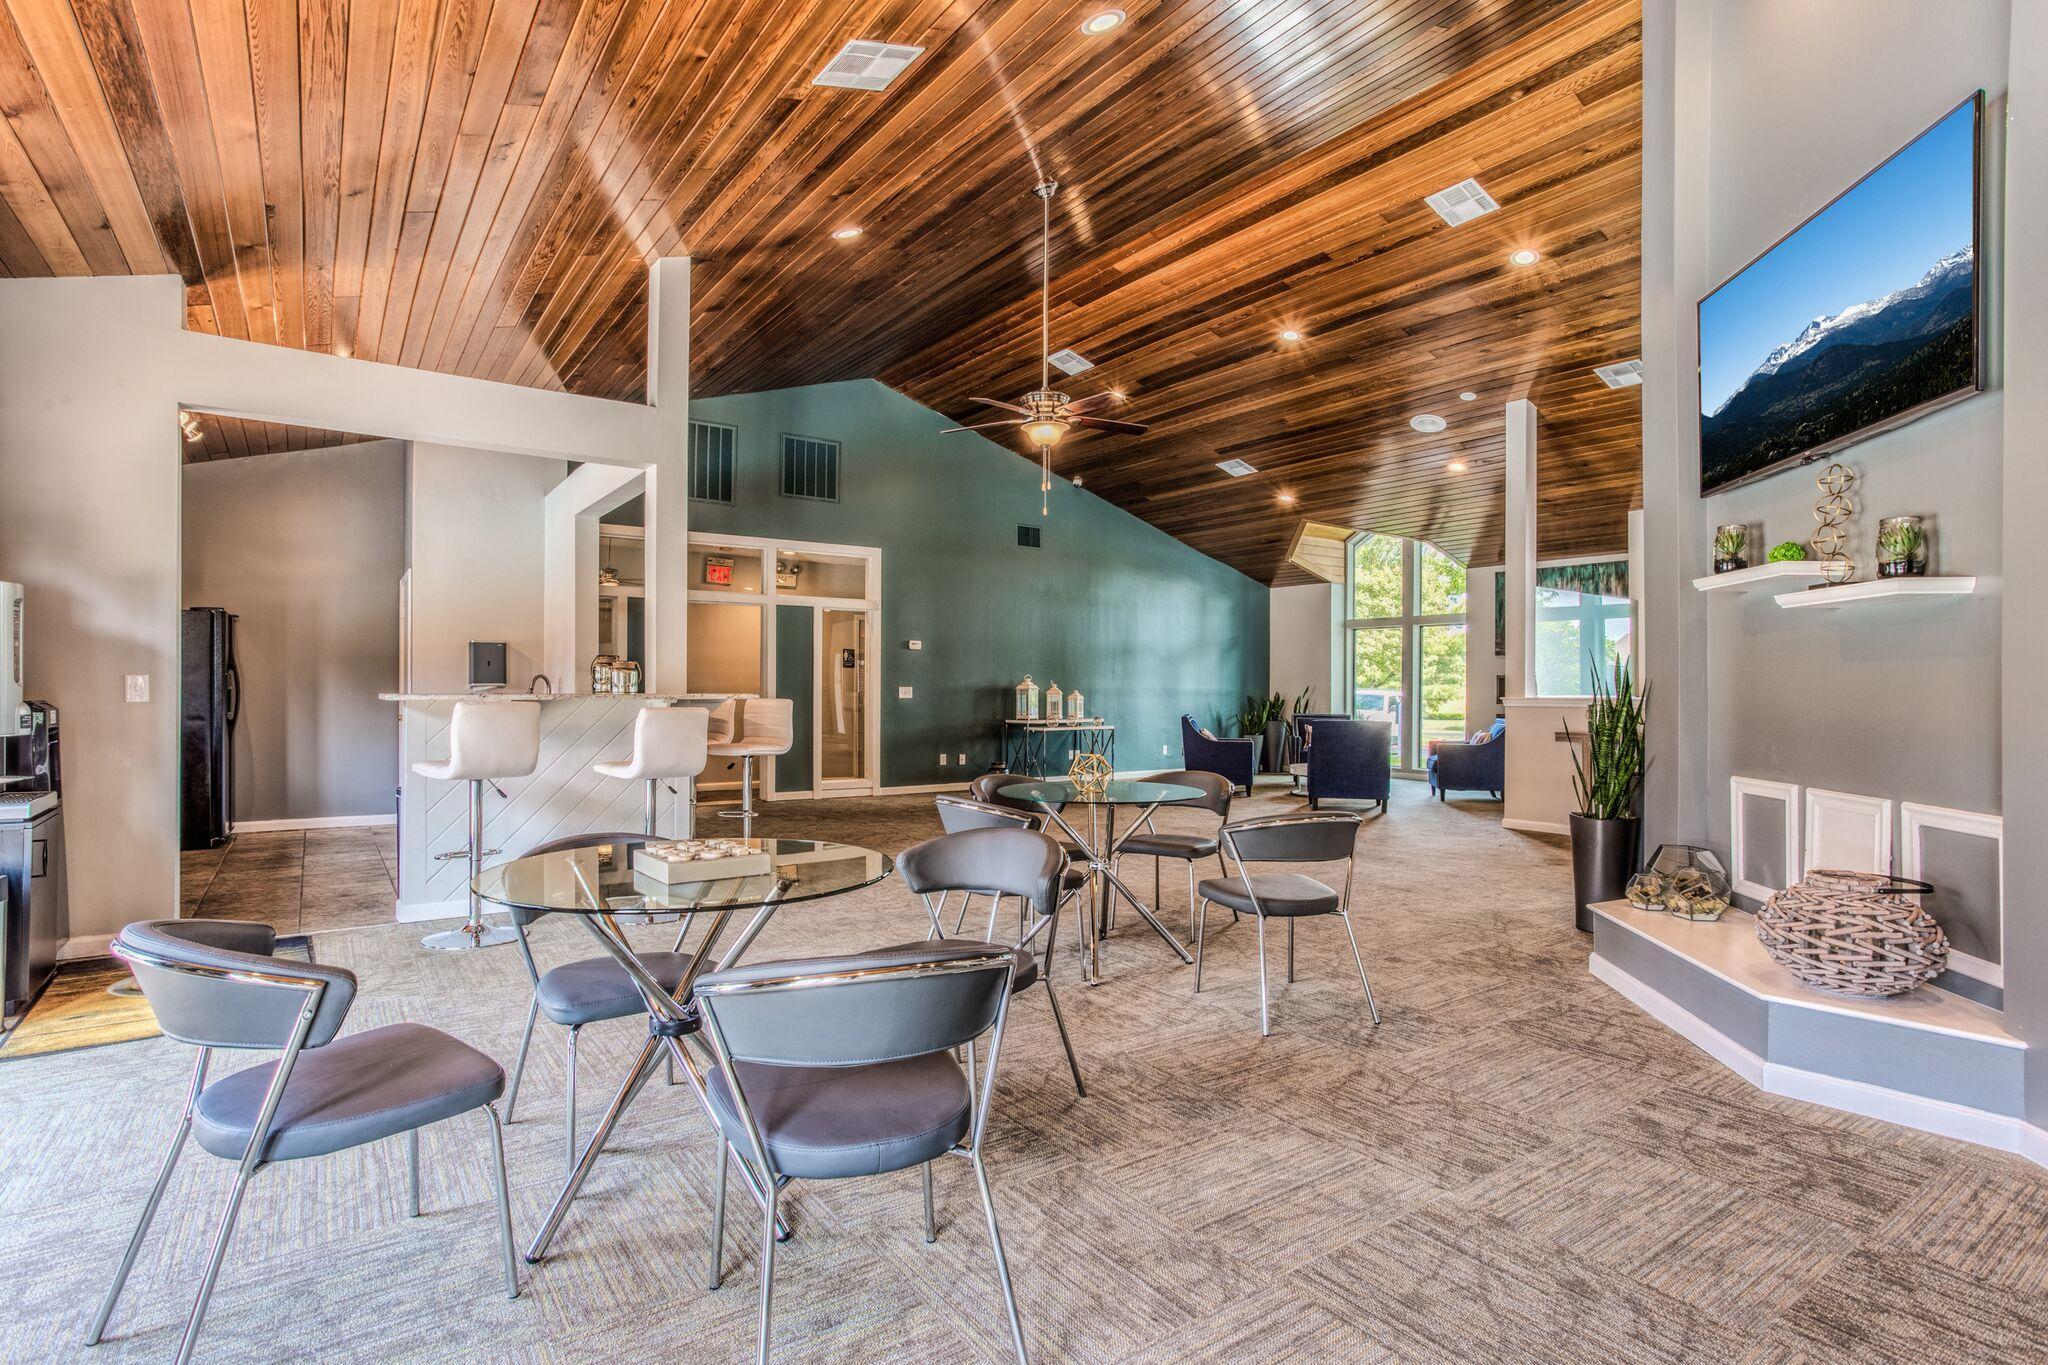 Magnolia Parc Apartments In Overland Park, KS